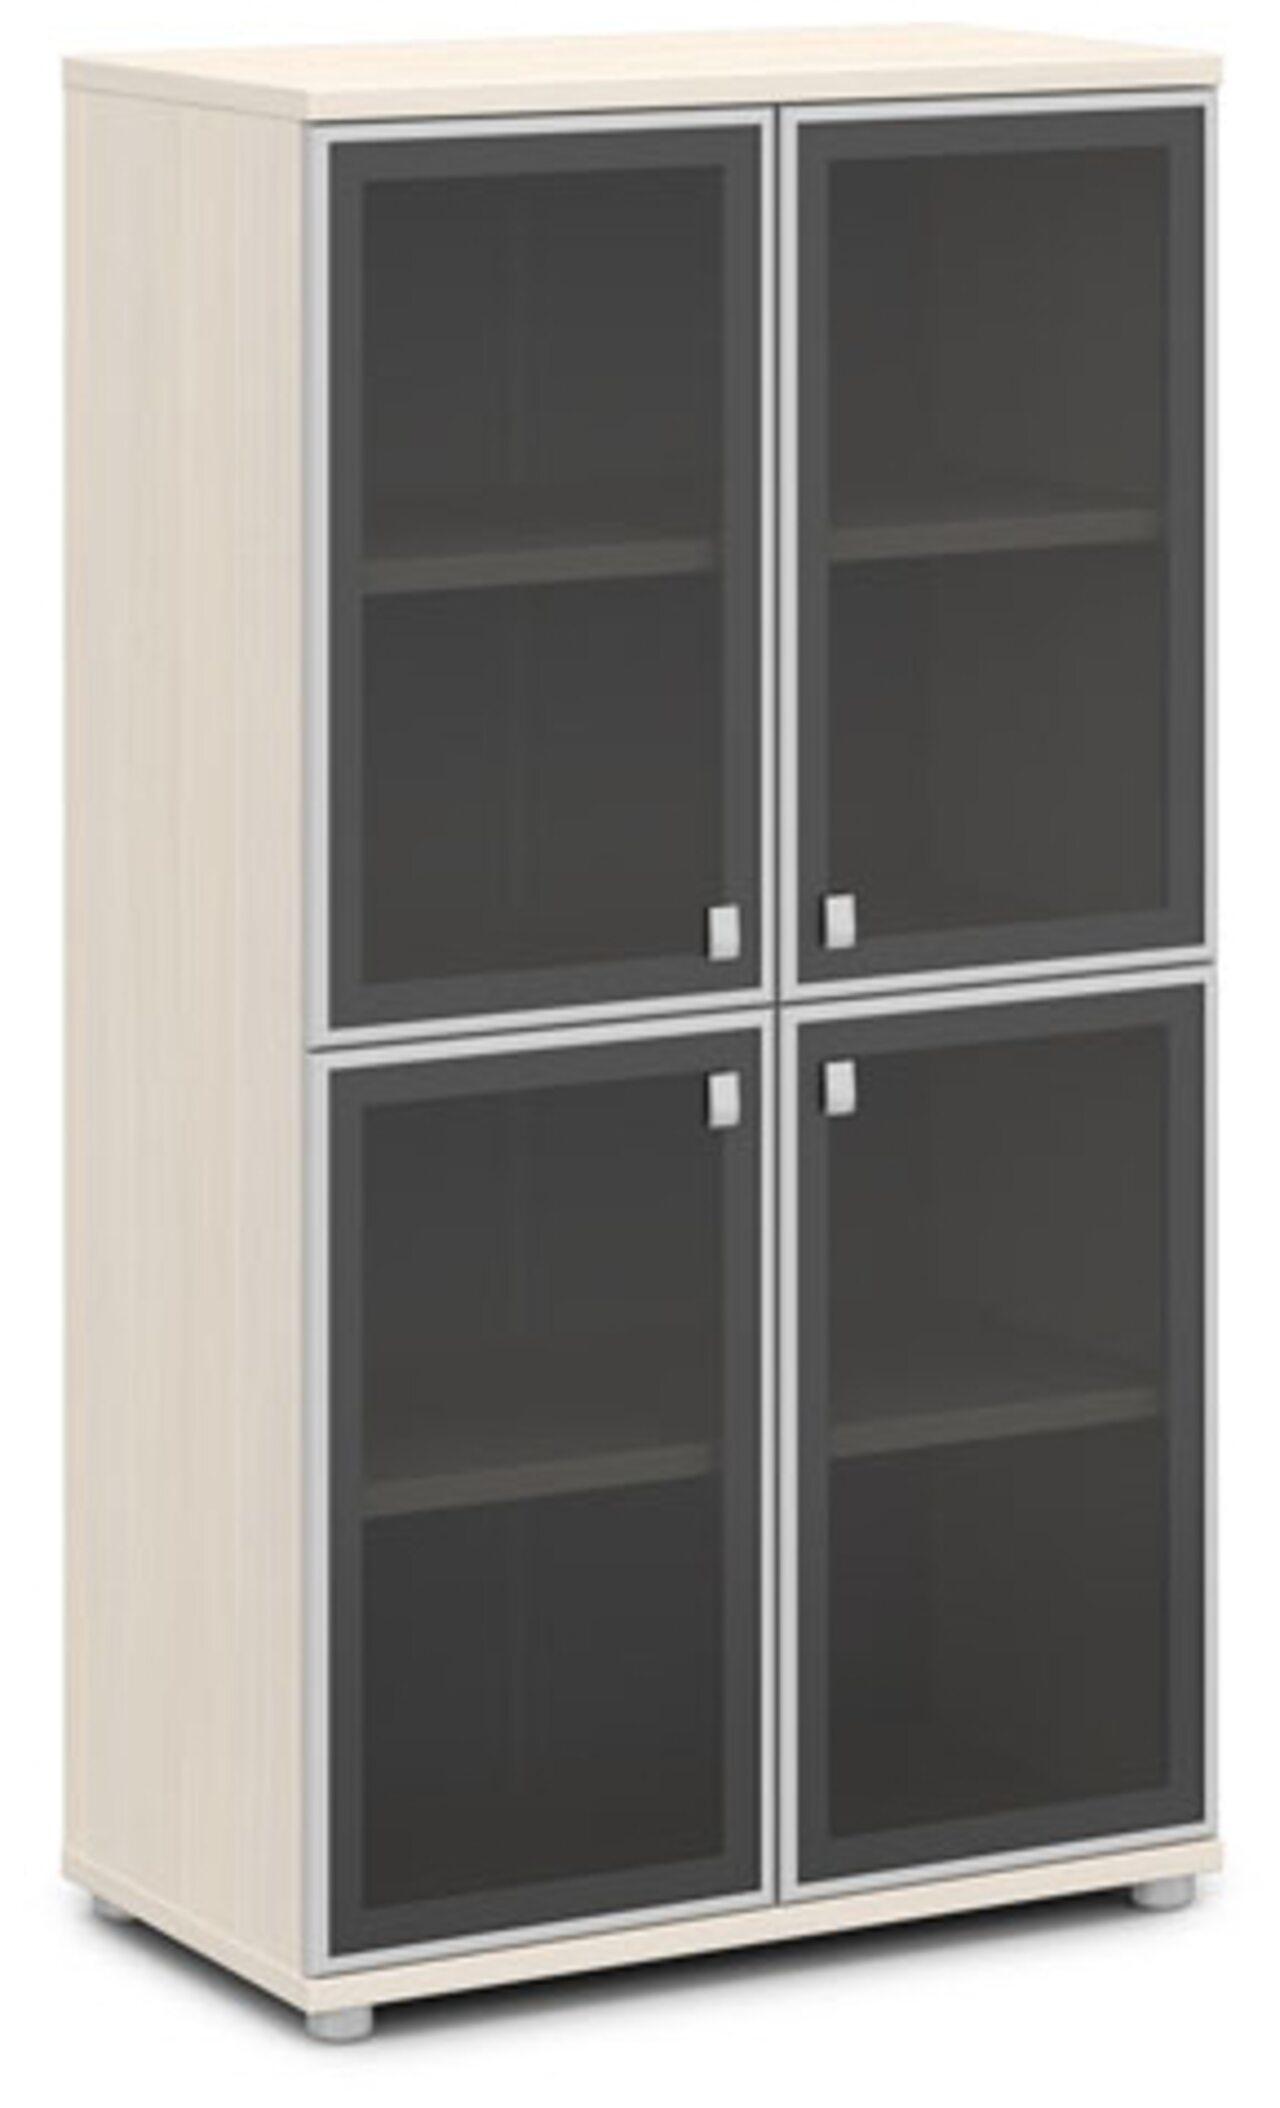 Шкаф со стеклом в алюминиевом профиле  Vasanta 82x44x149 - фото 6